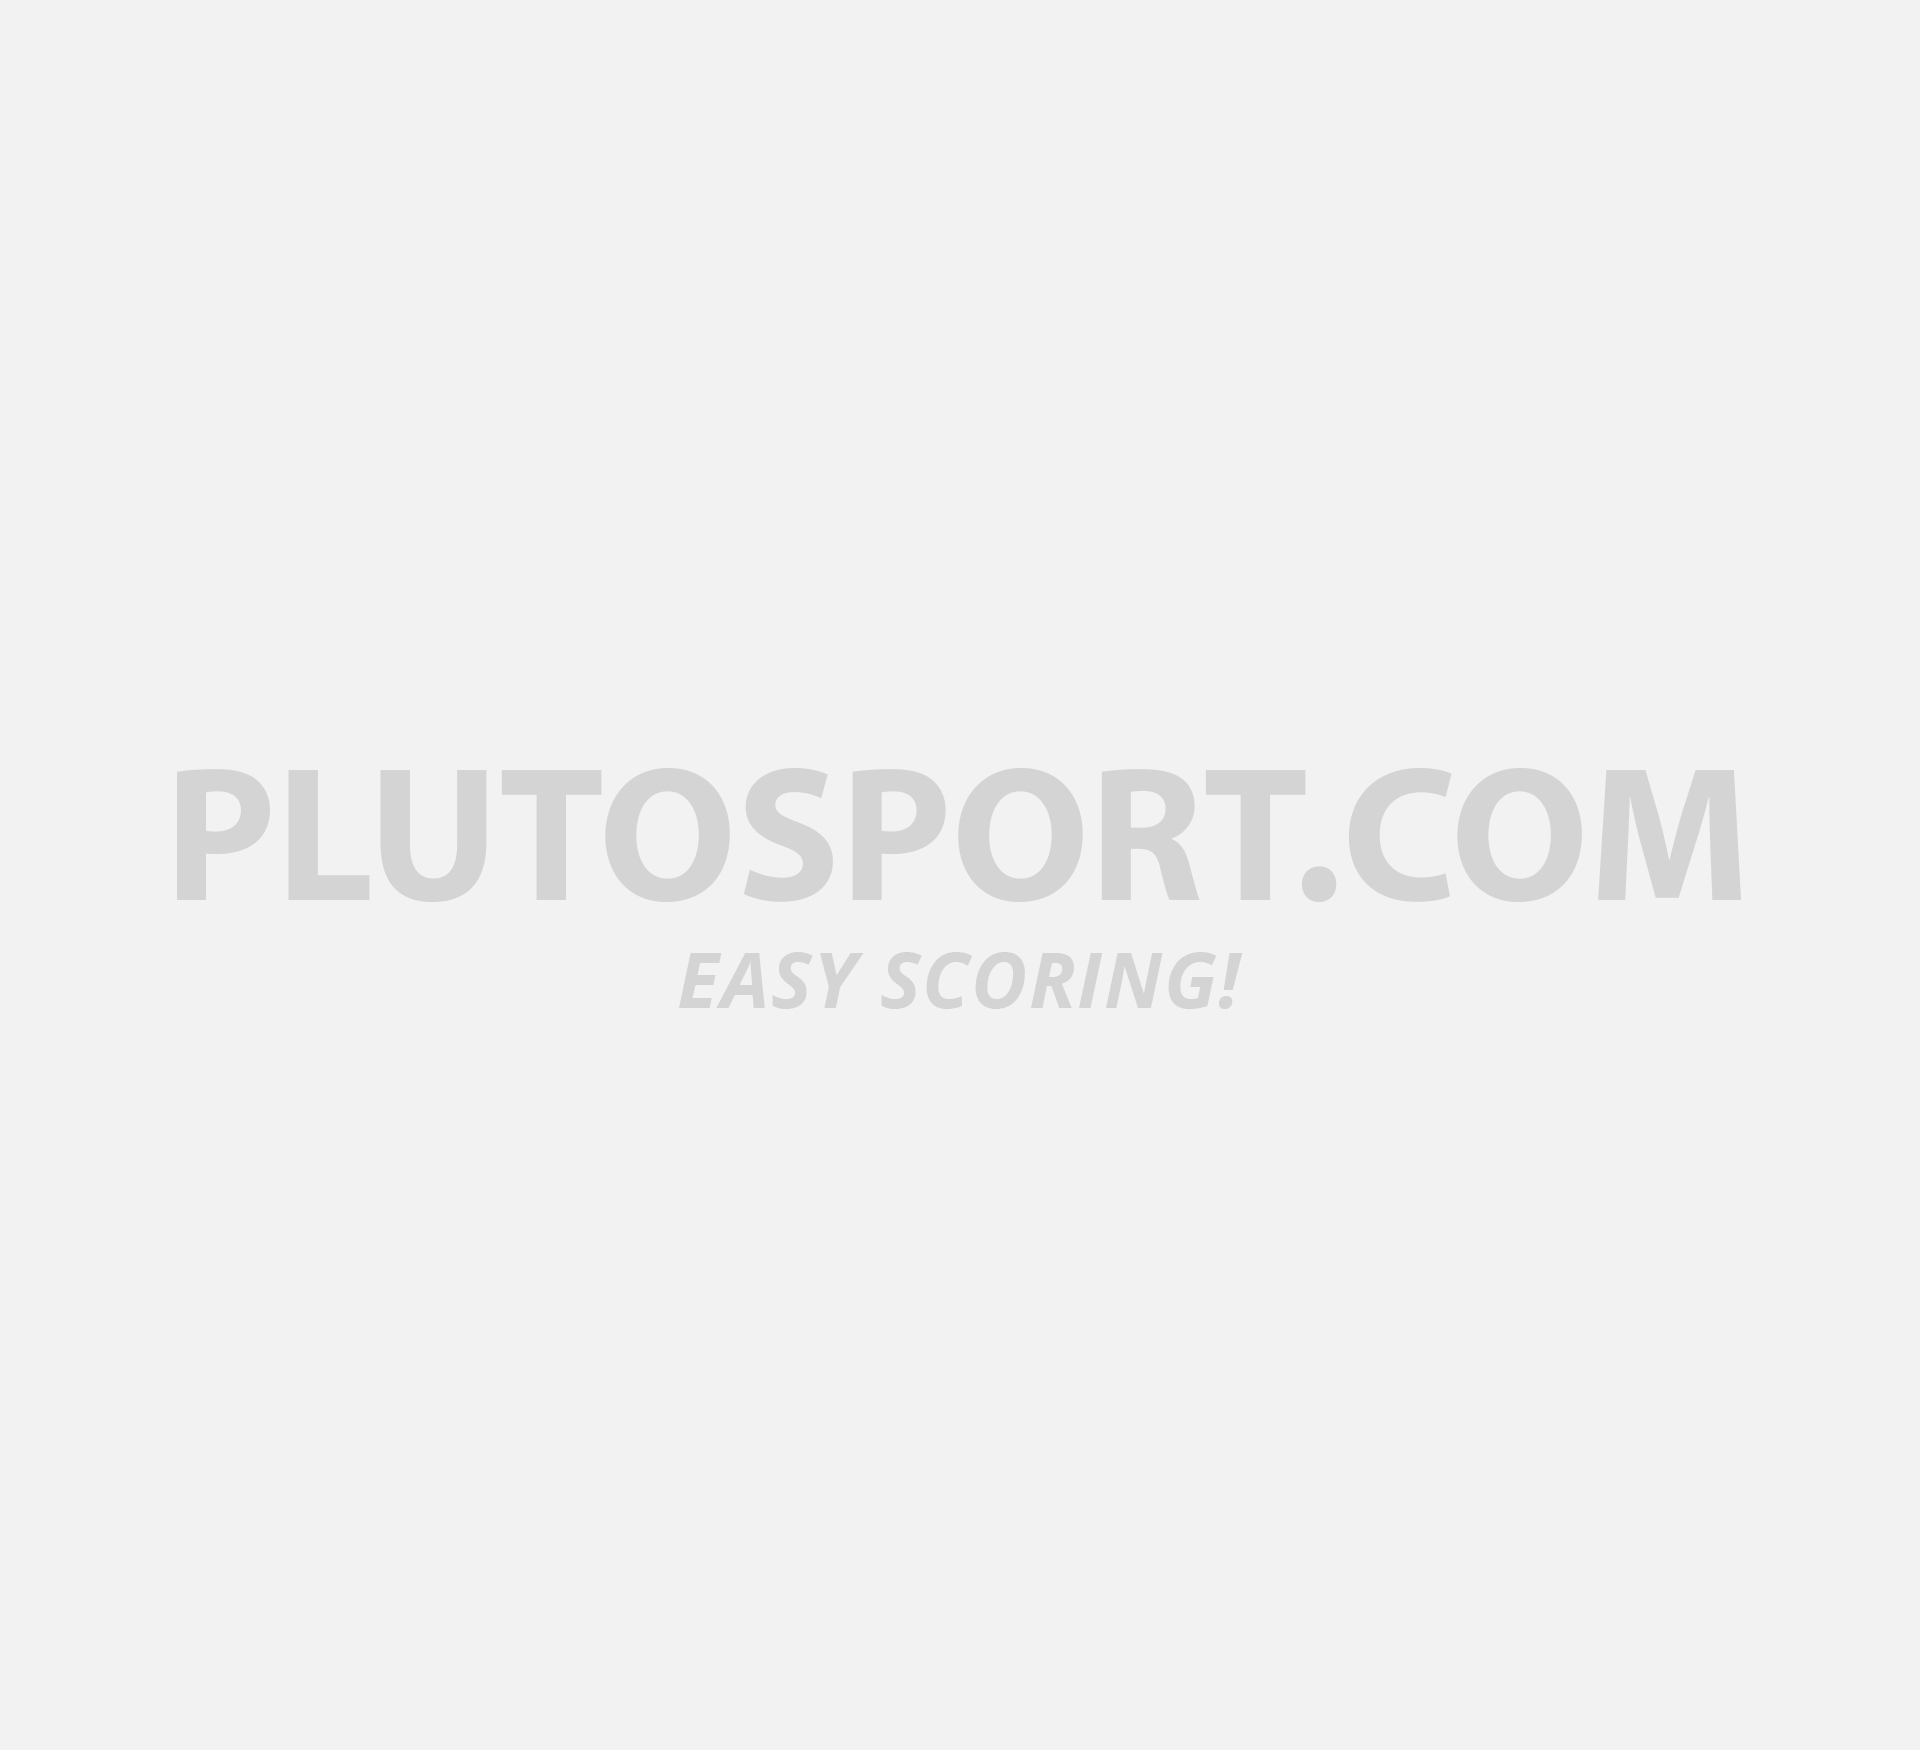 new concept adab6 f43a7 Adidas Predator RX XTRX SG Rugbyshoe Mens - Boots screw stud - Shoes -  Football - Sports   Plutosport